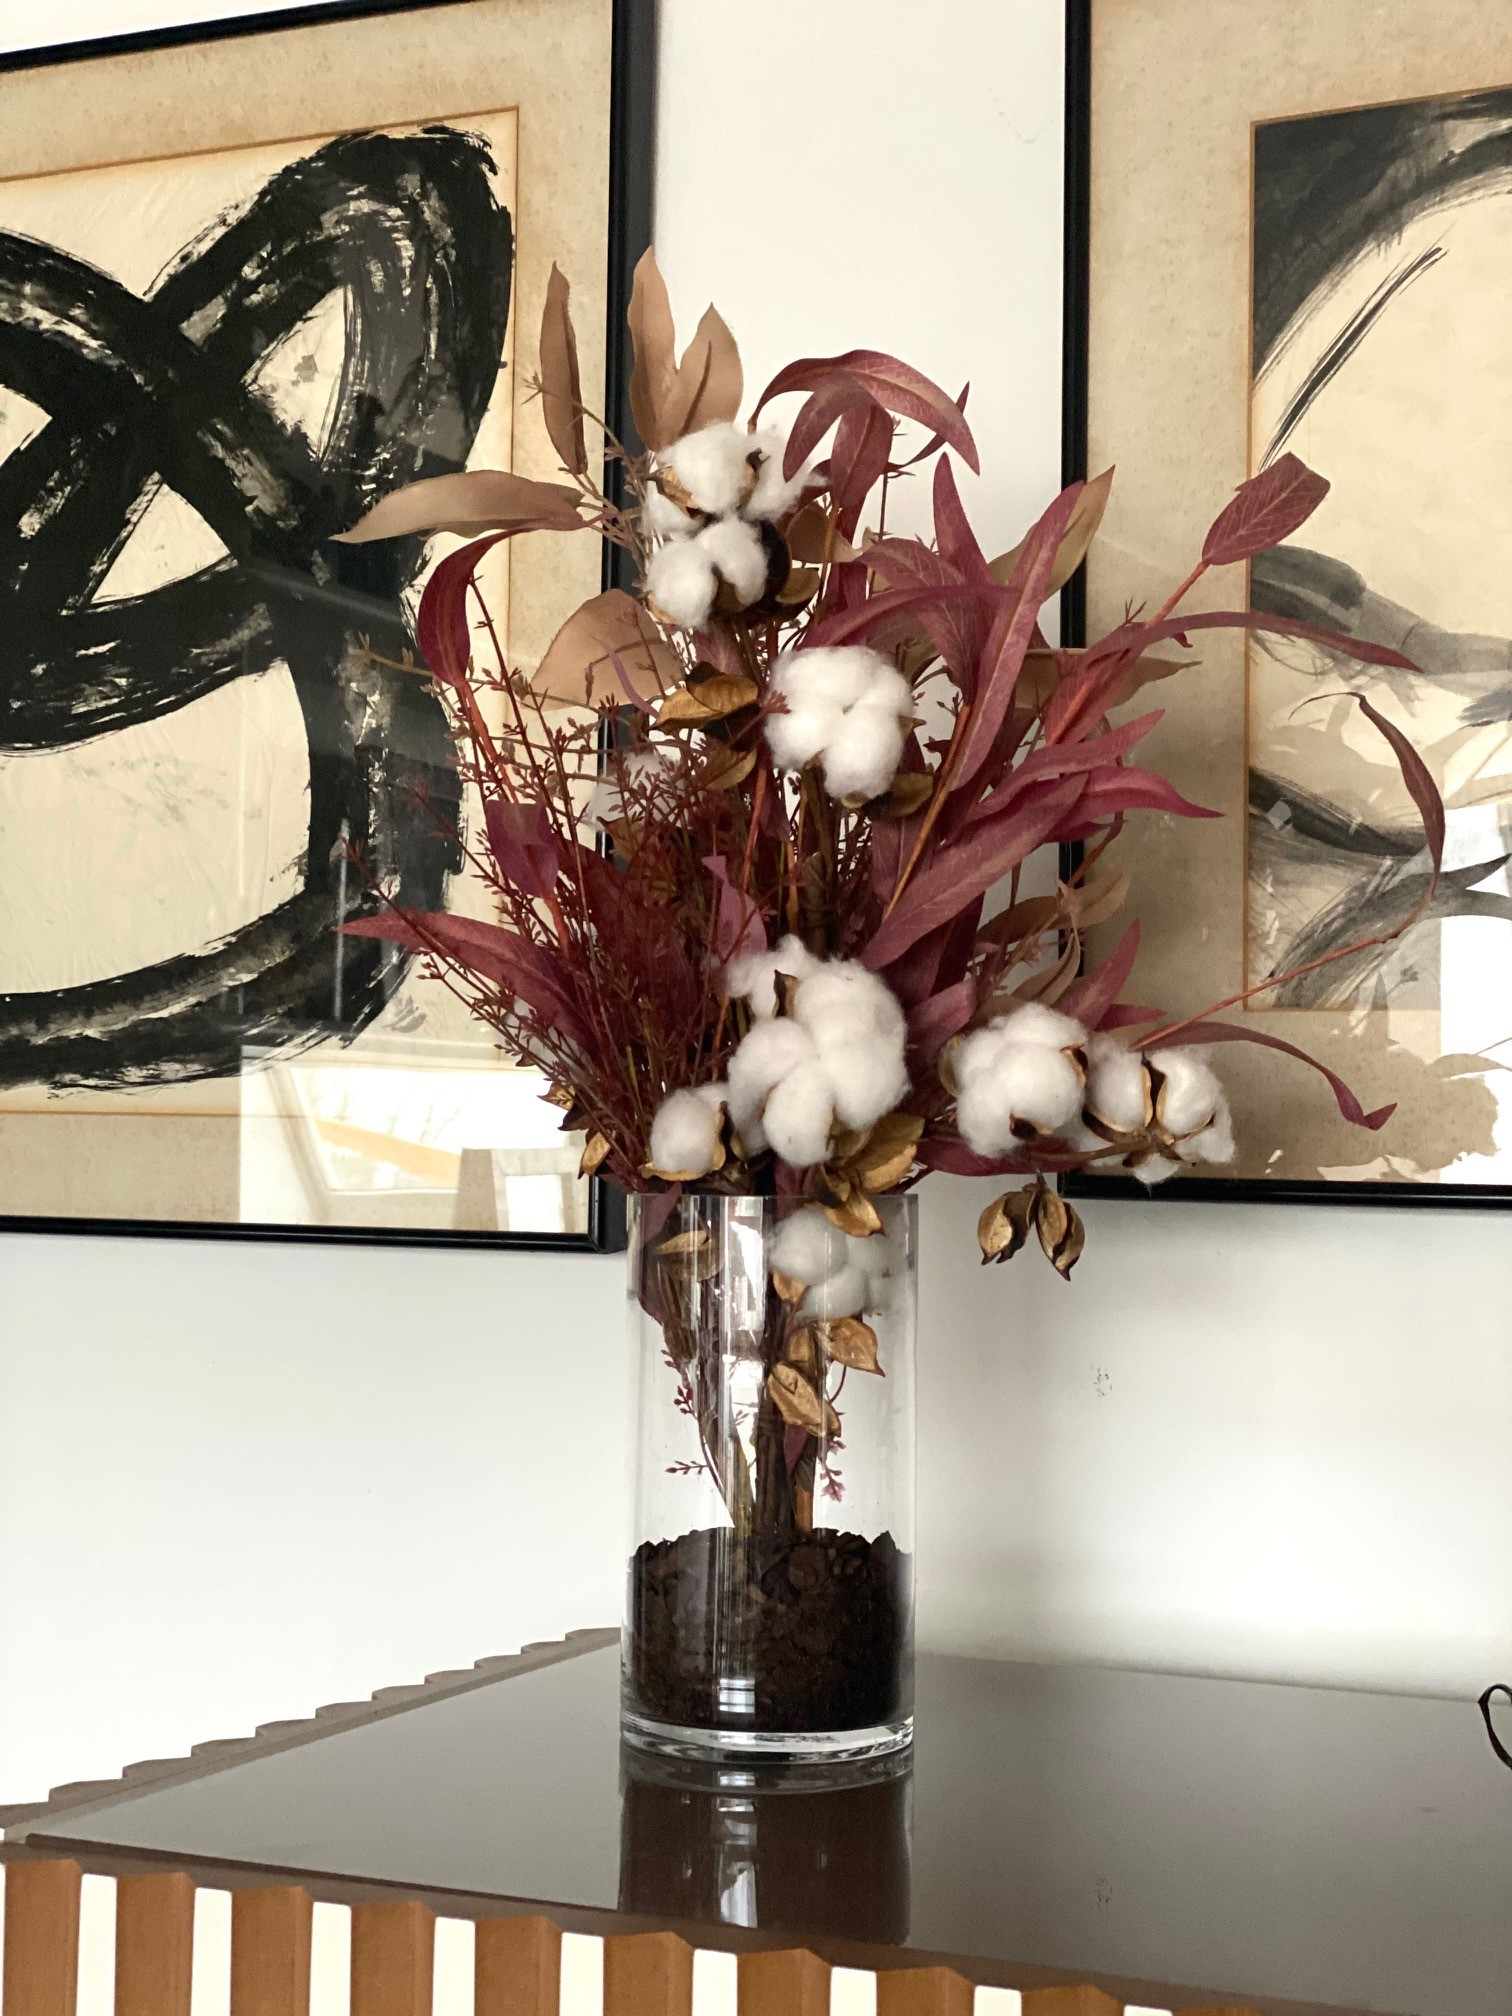 Centro alto de eucalyptus y flor de algodón.